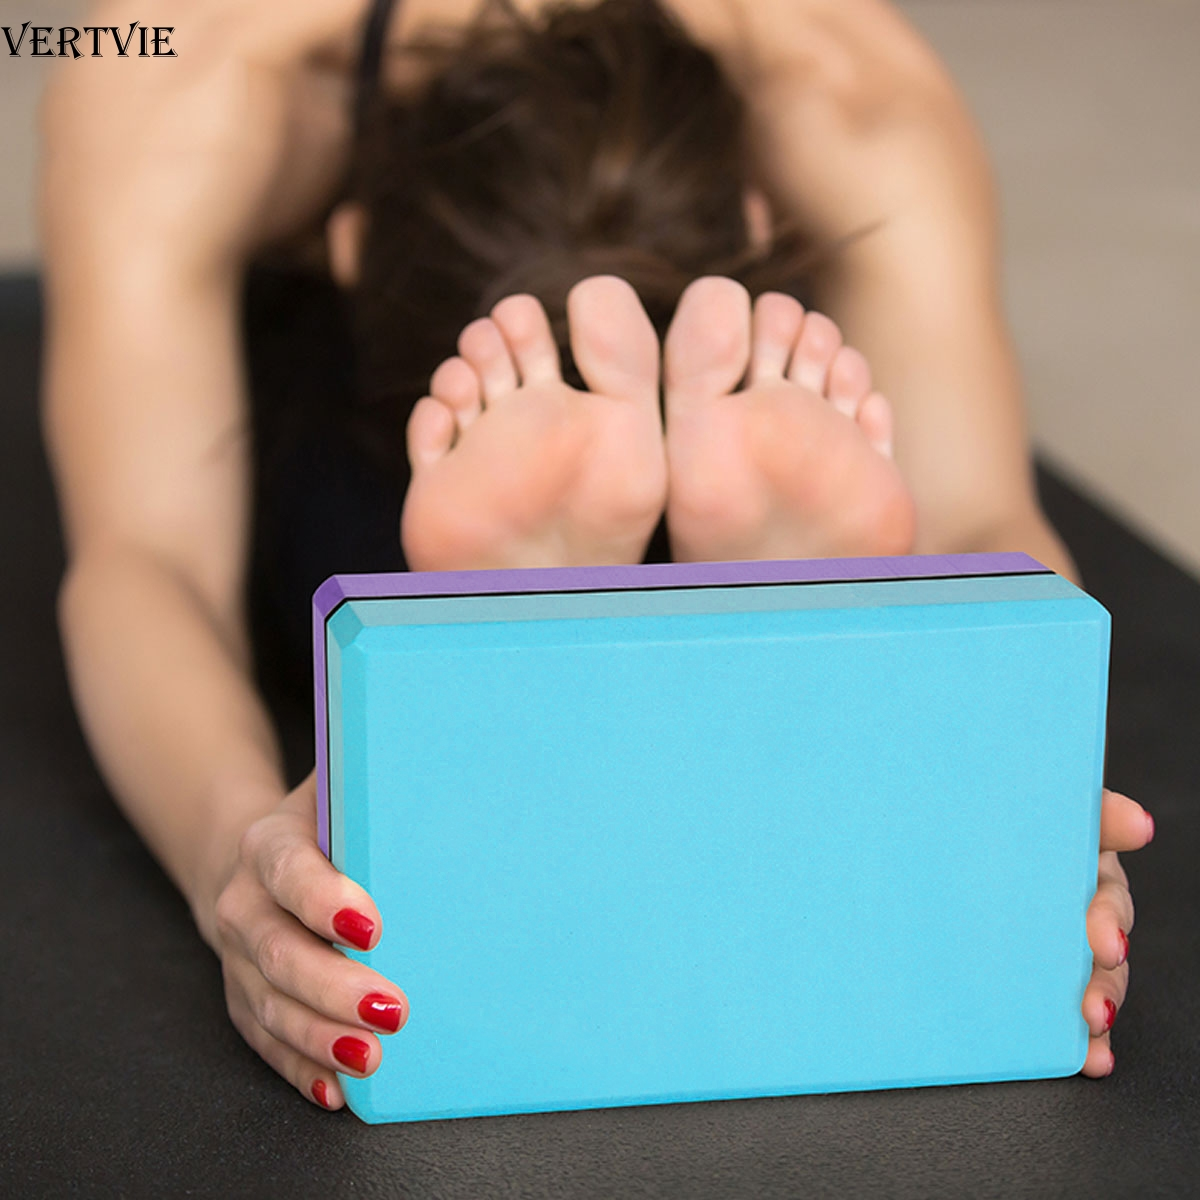 Gym Yoga Block Foam Brick Exercise Fitness Bolster Pillow Cushion Stretch Body Shape Health Training Yoga Pilates